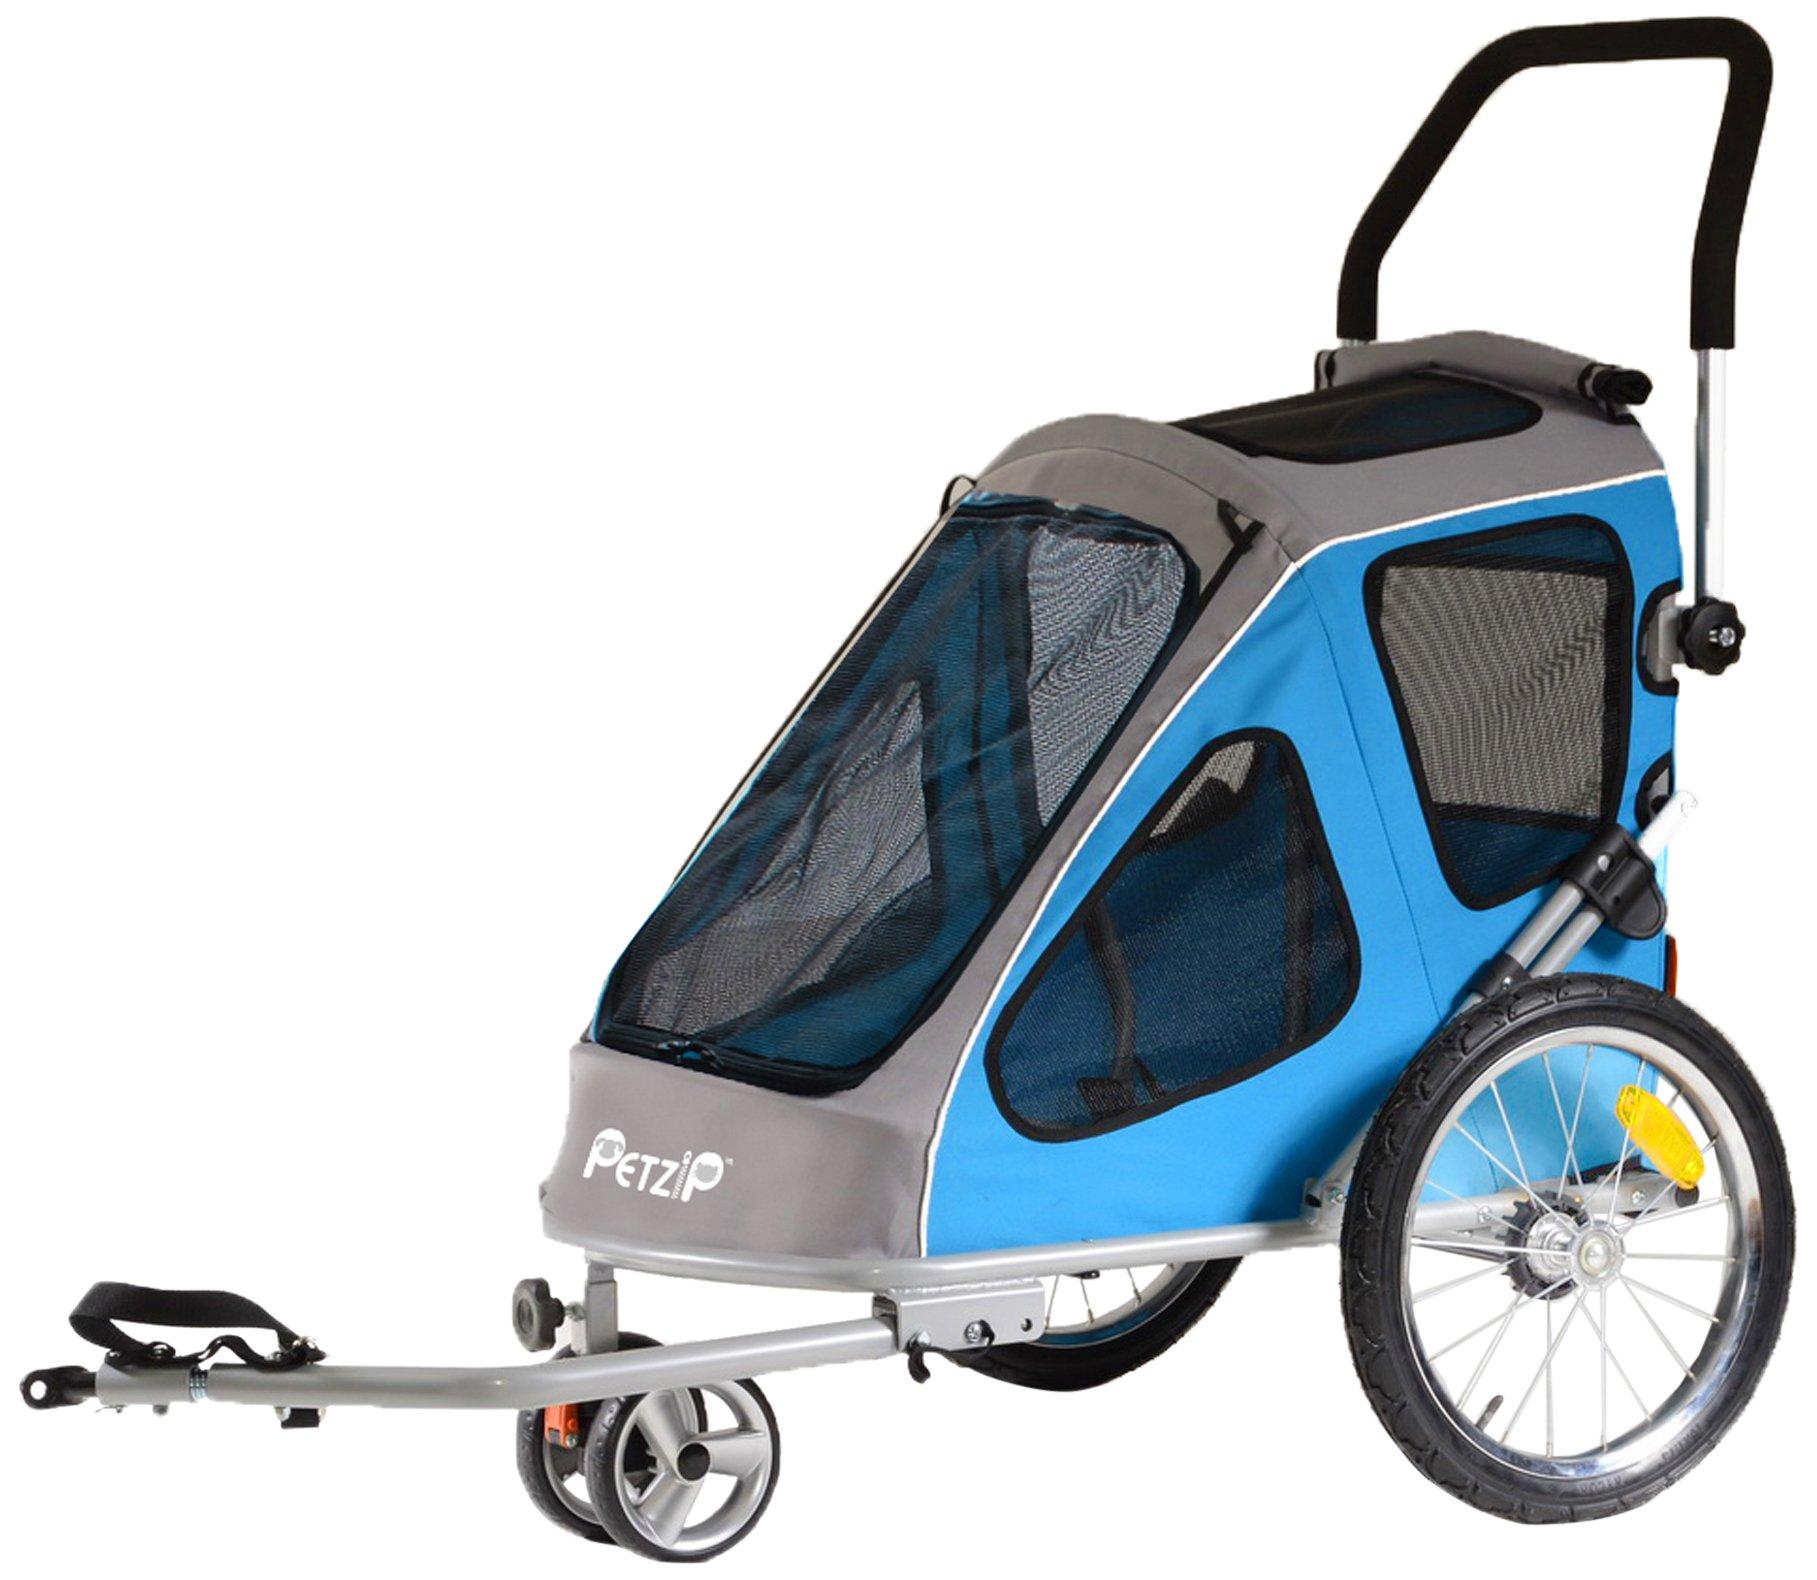 Petzip Zoom Trailer/Stroller, Blue by Petzip